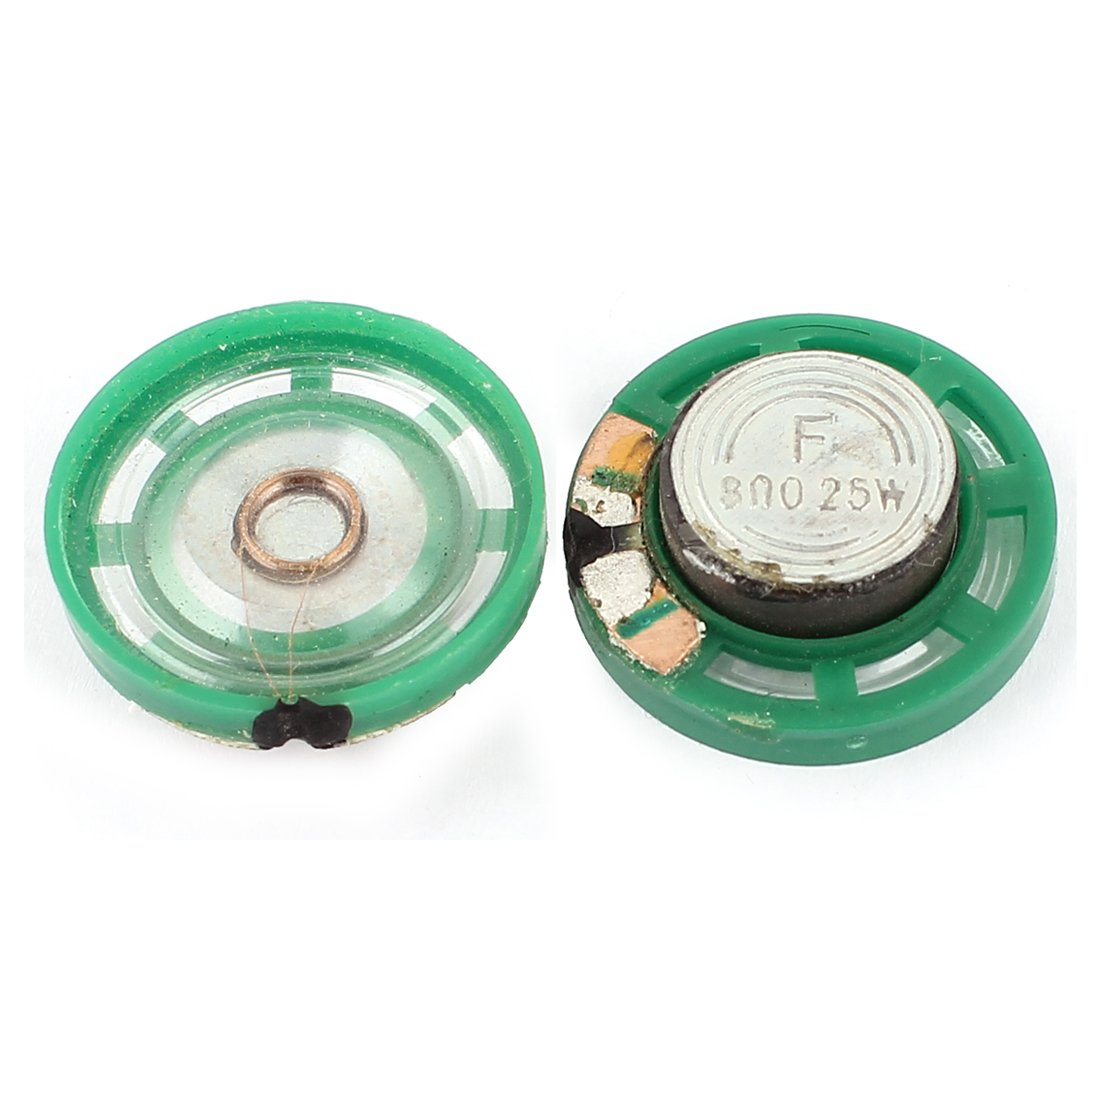 uxcell 2Pcs 8 Ohm 0.25W 27mm Dia External Magnet Mini Loudspeaker Horn Green